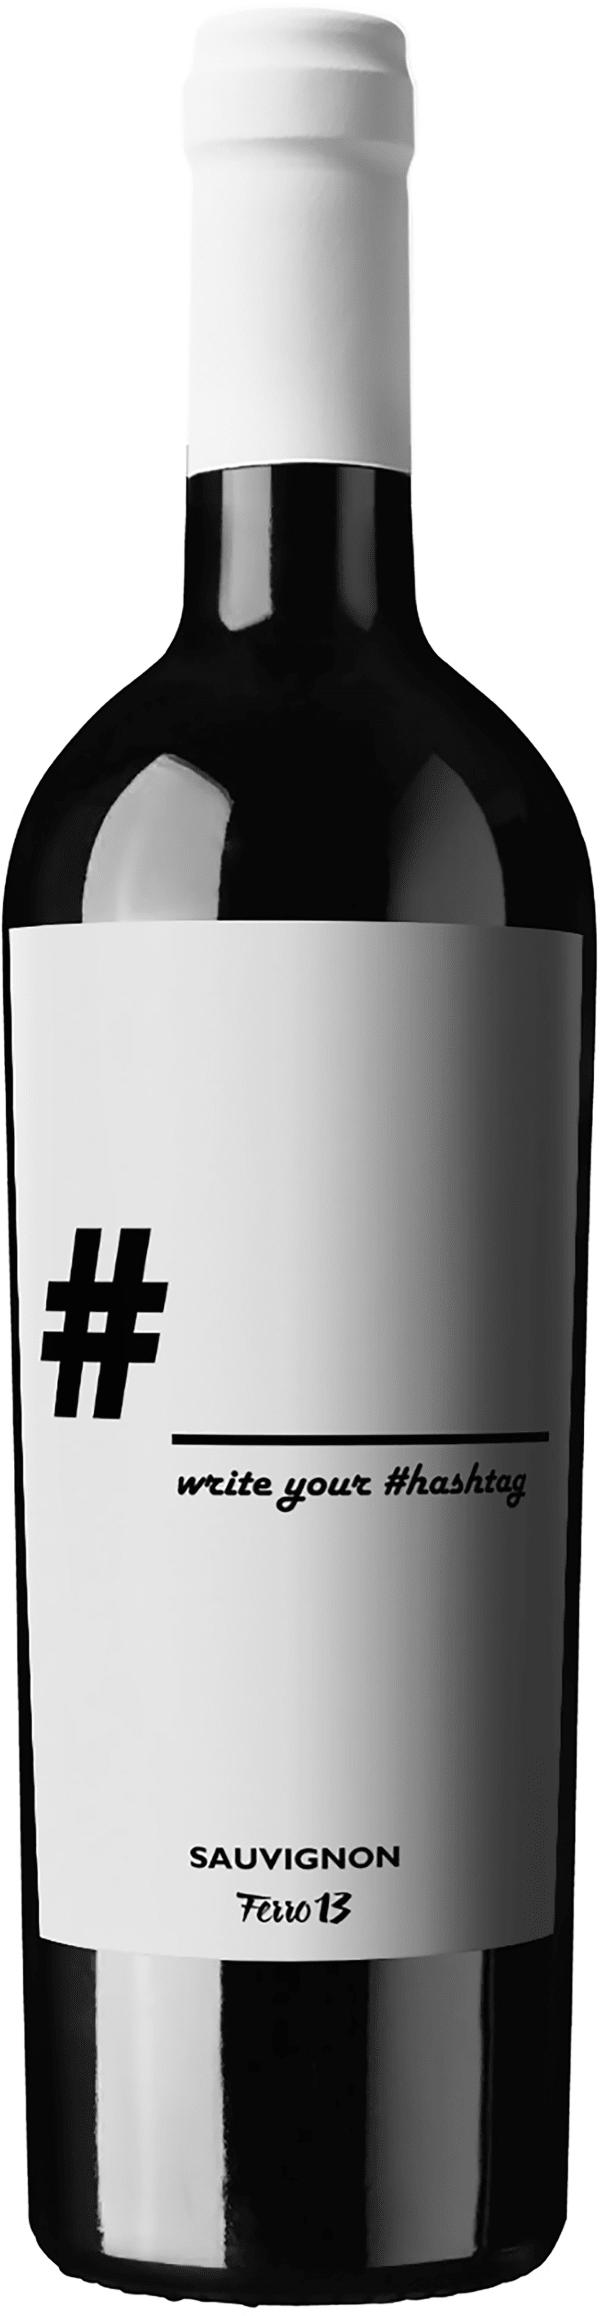 Hashtag Sauvignon 2016